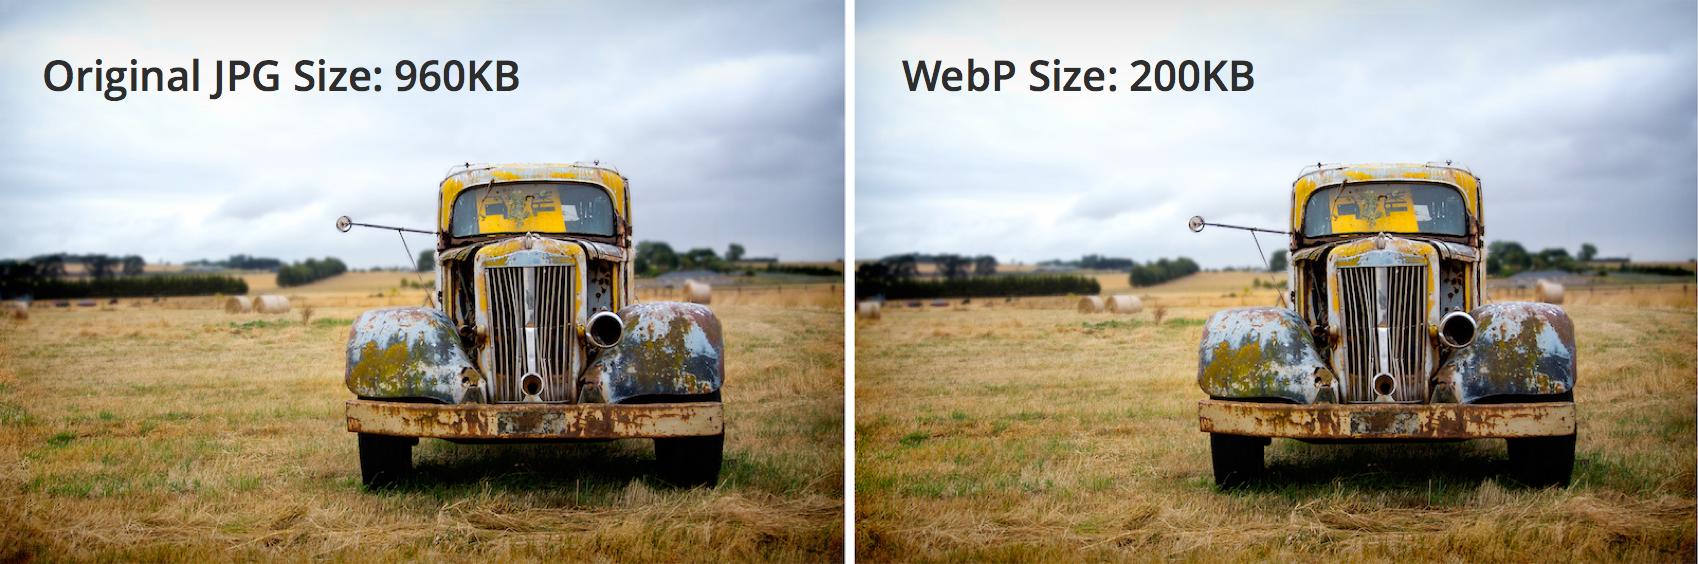 jpg vs. webp